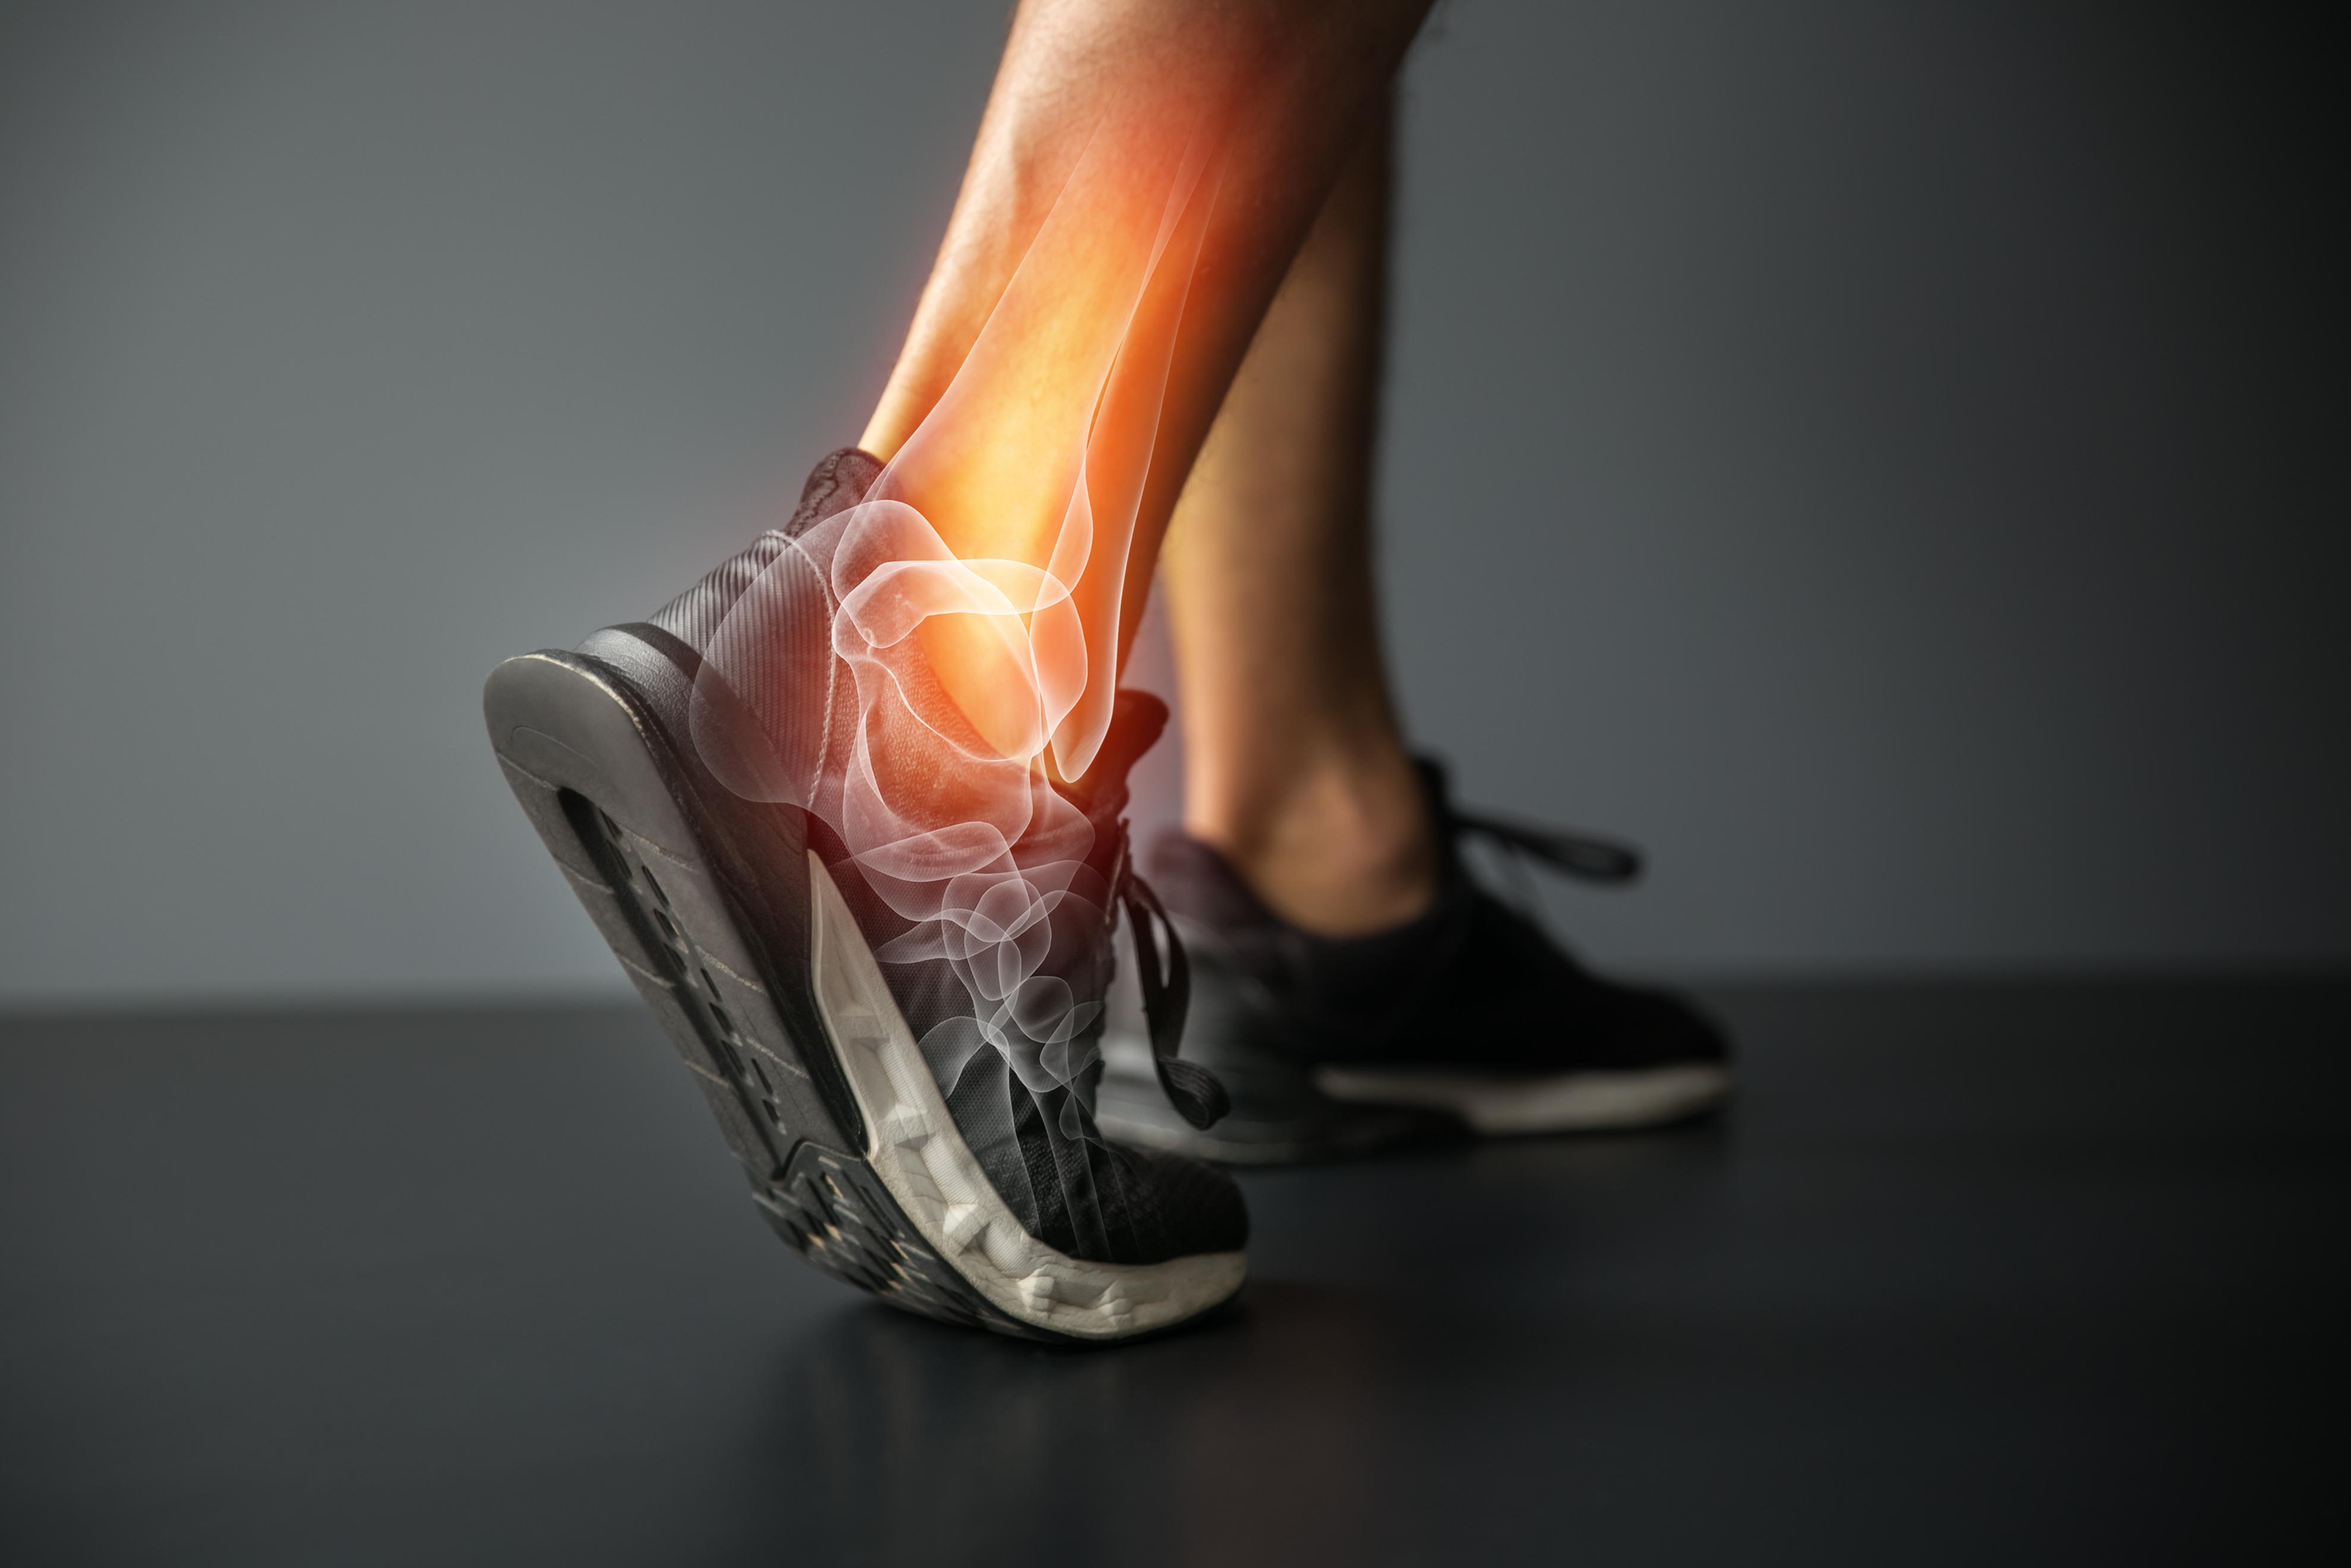 vermont urgent care ankle sprain